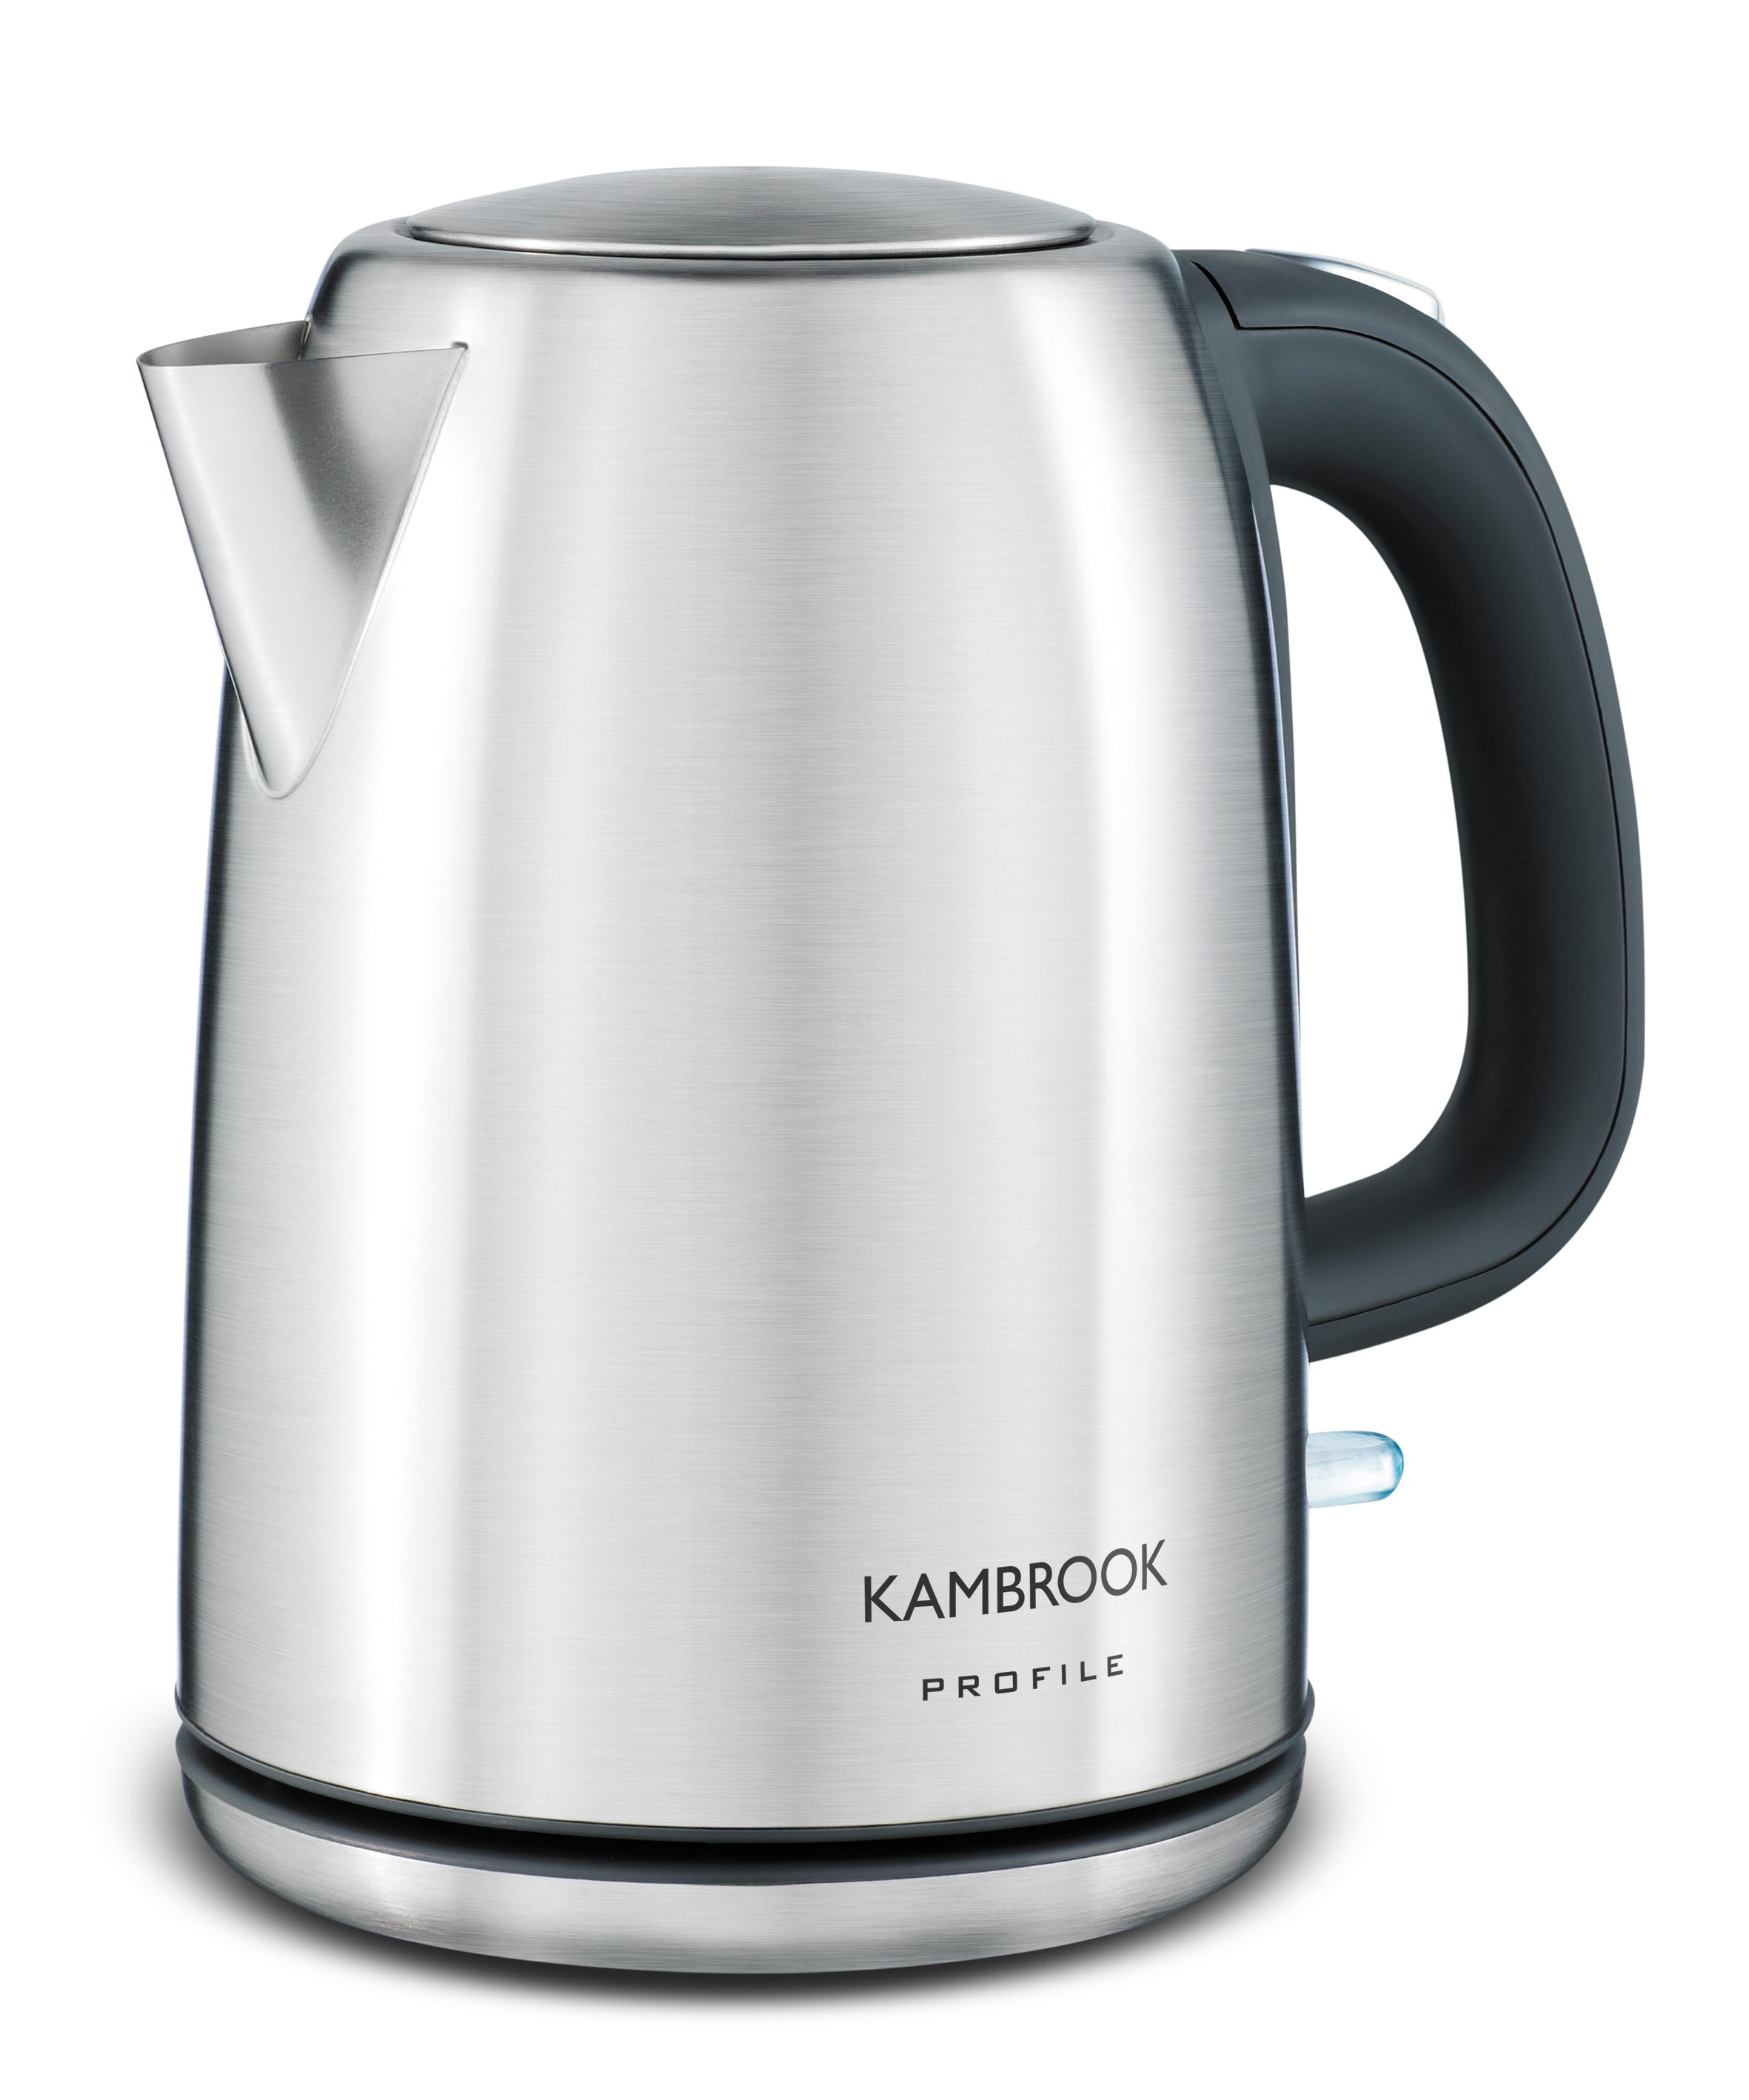 Avoid Kambrook appliances | Clicks on Hellopeter.com